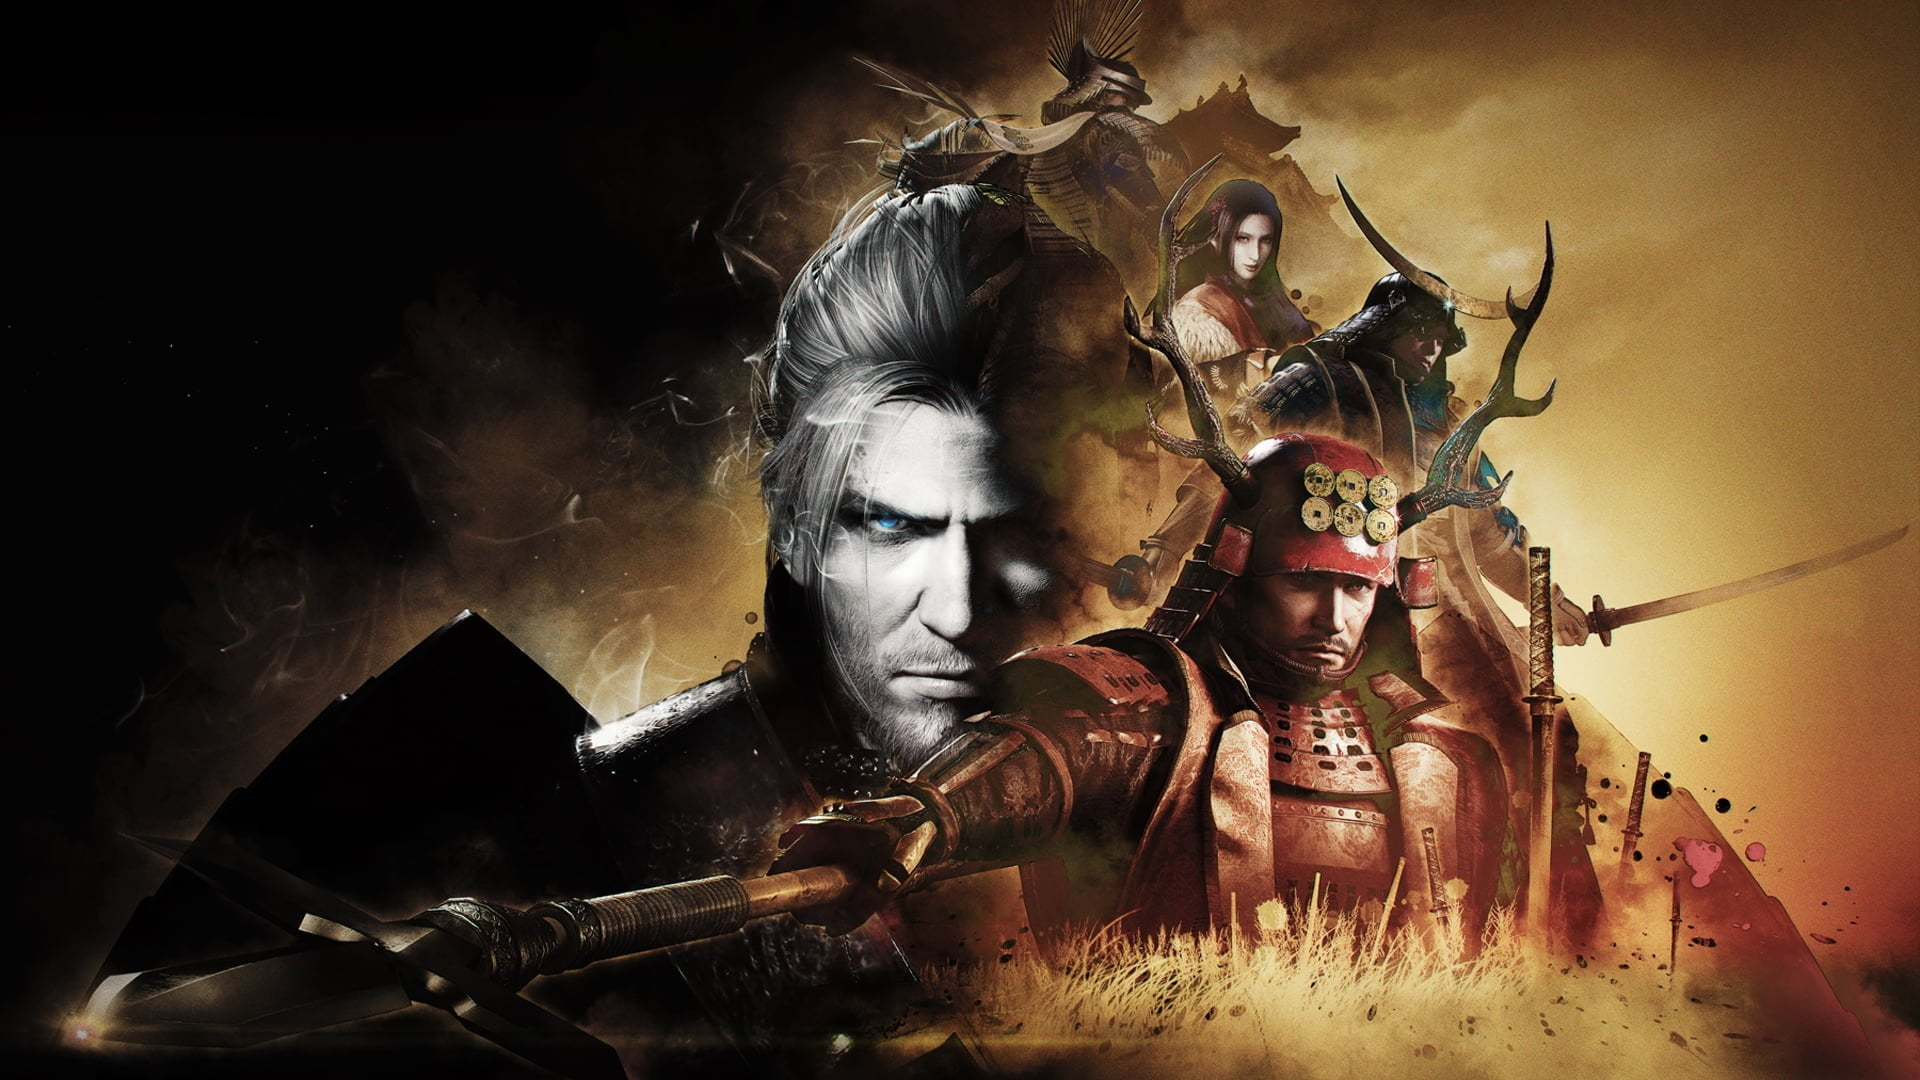 Giappone Feudale: 4 Videogiochi Più Caratteristici 5 - Hynerd.it